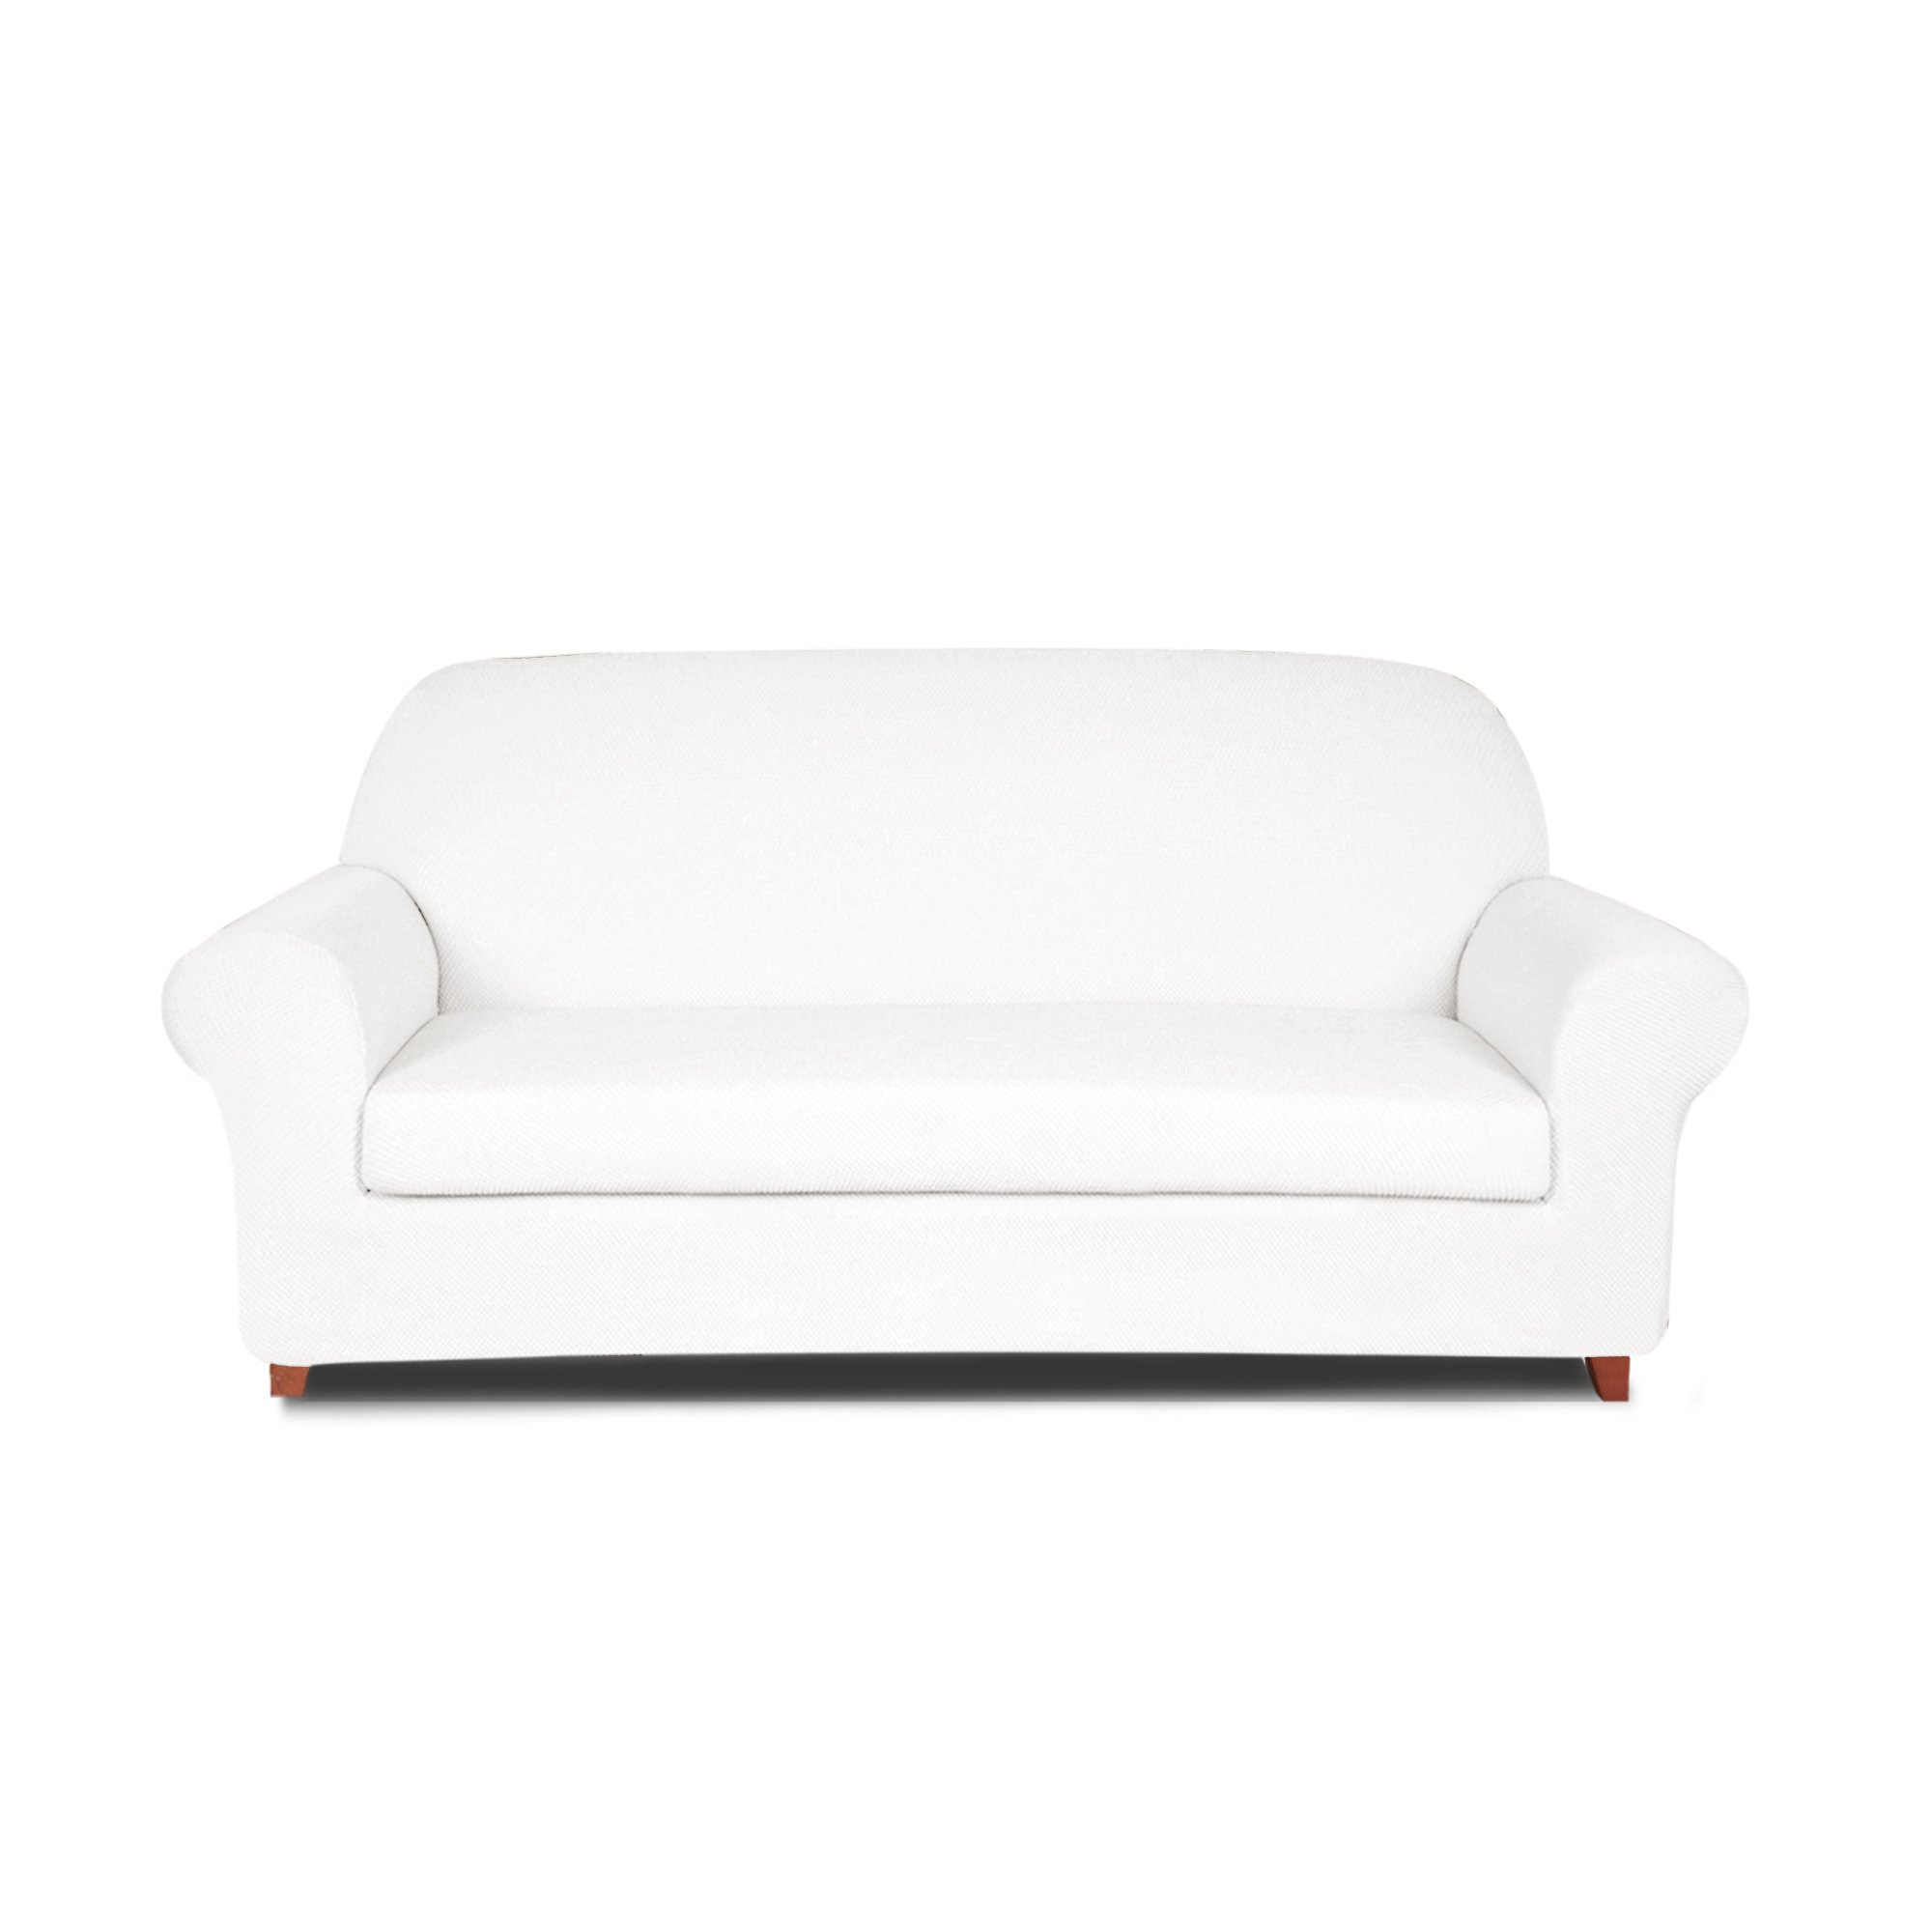 DyFun 2-Piece Jacquard Spandex Stretch Living Room Sofa Slipcovers (Loveseat, White)